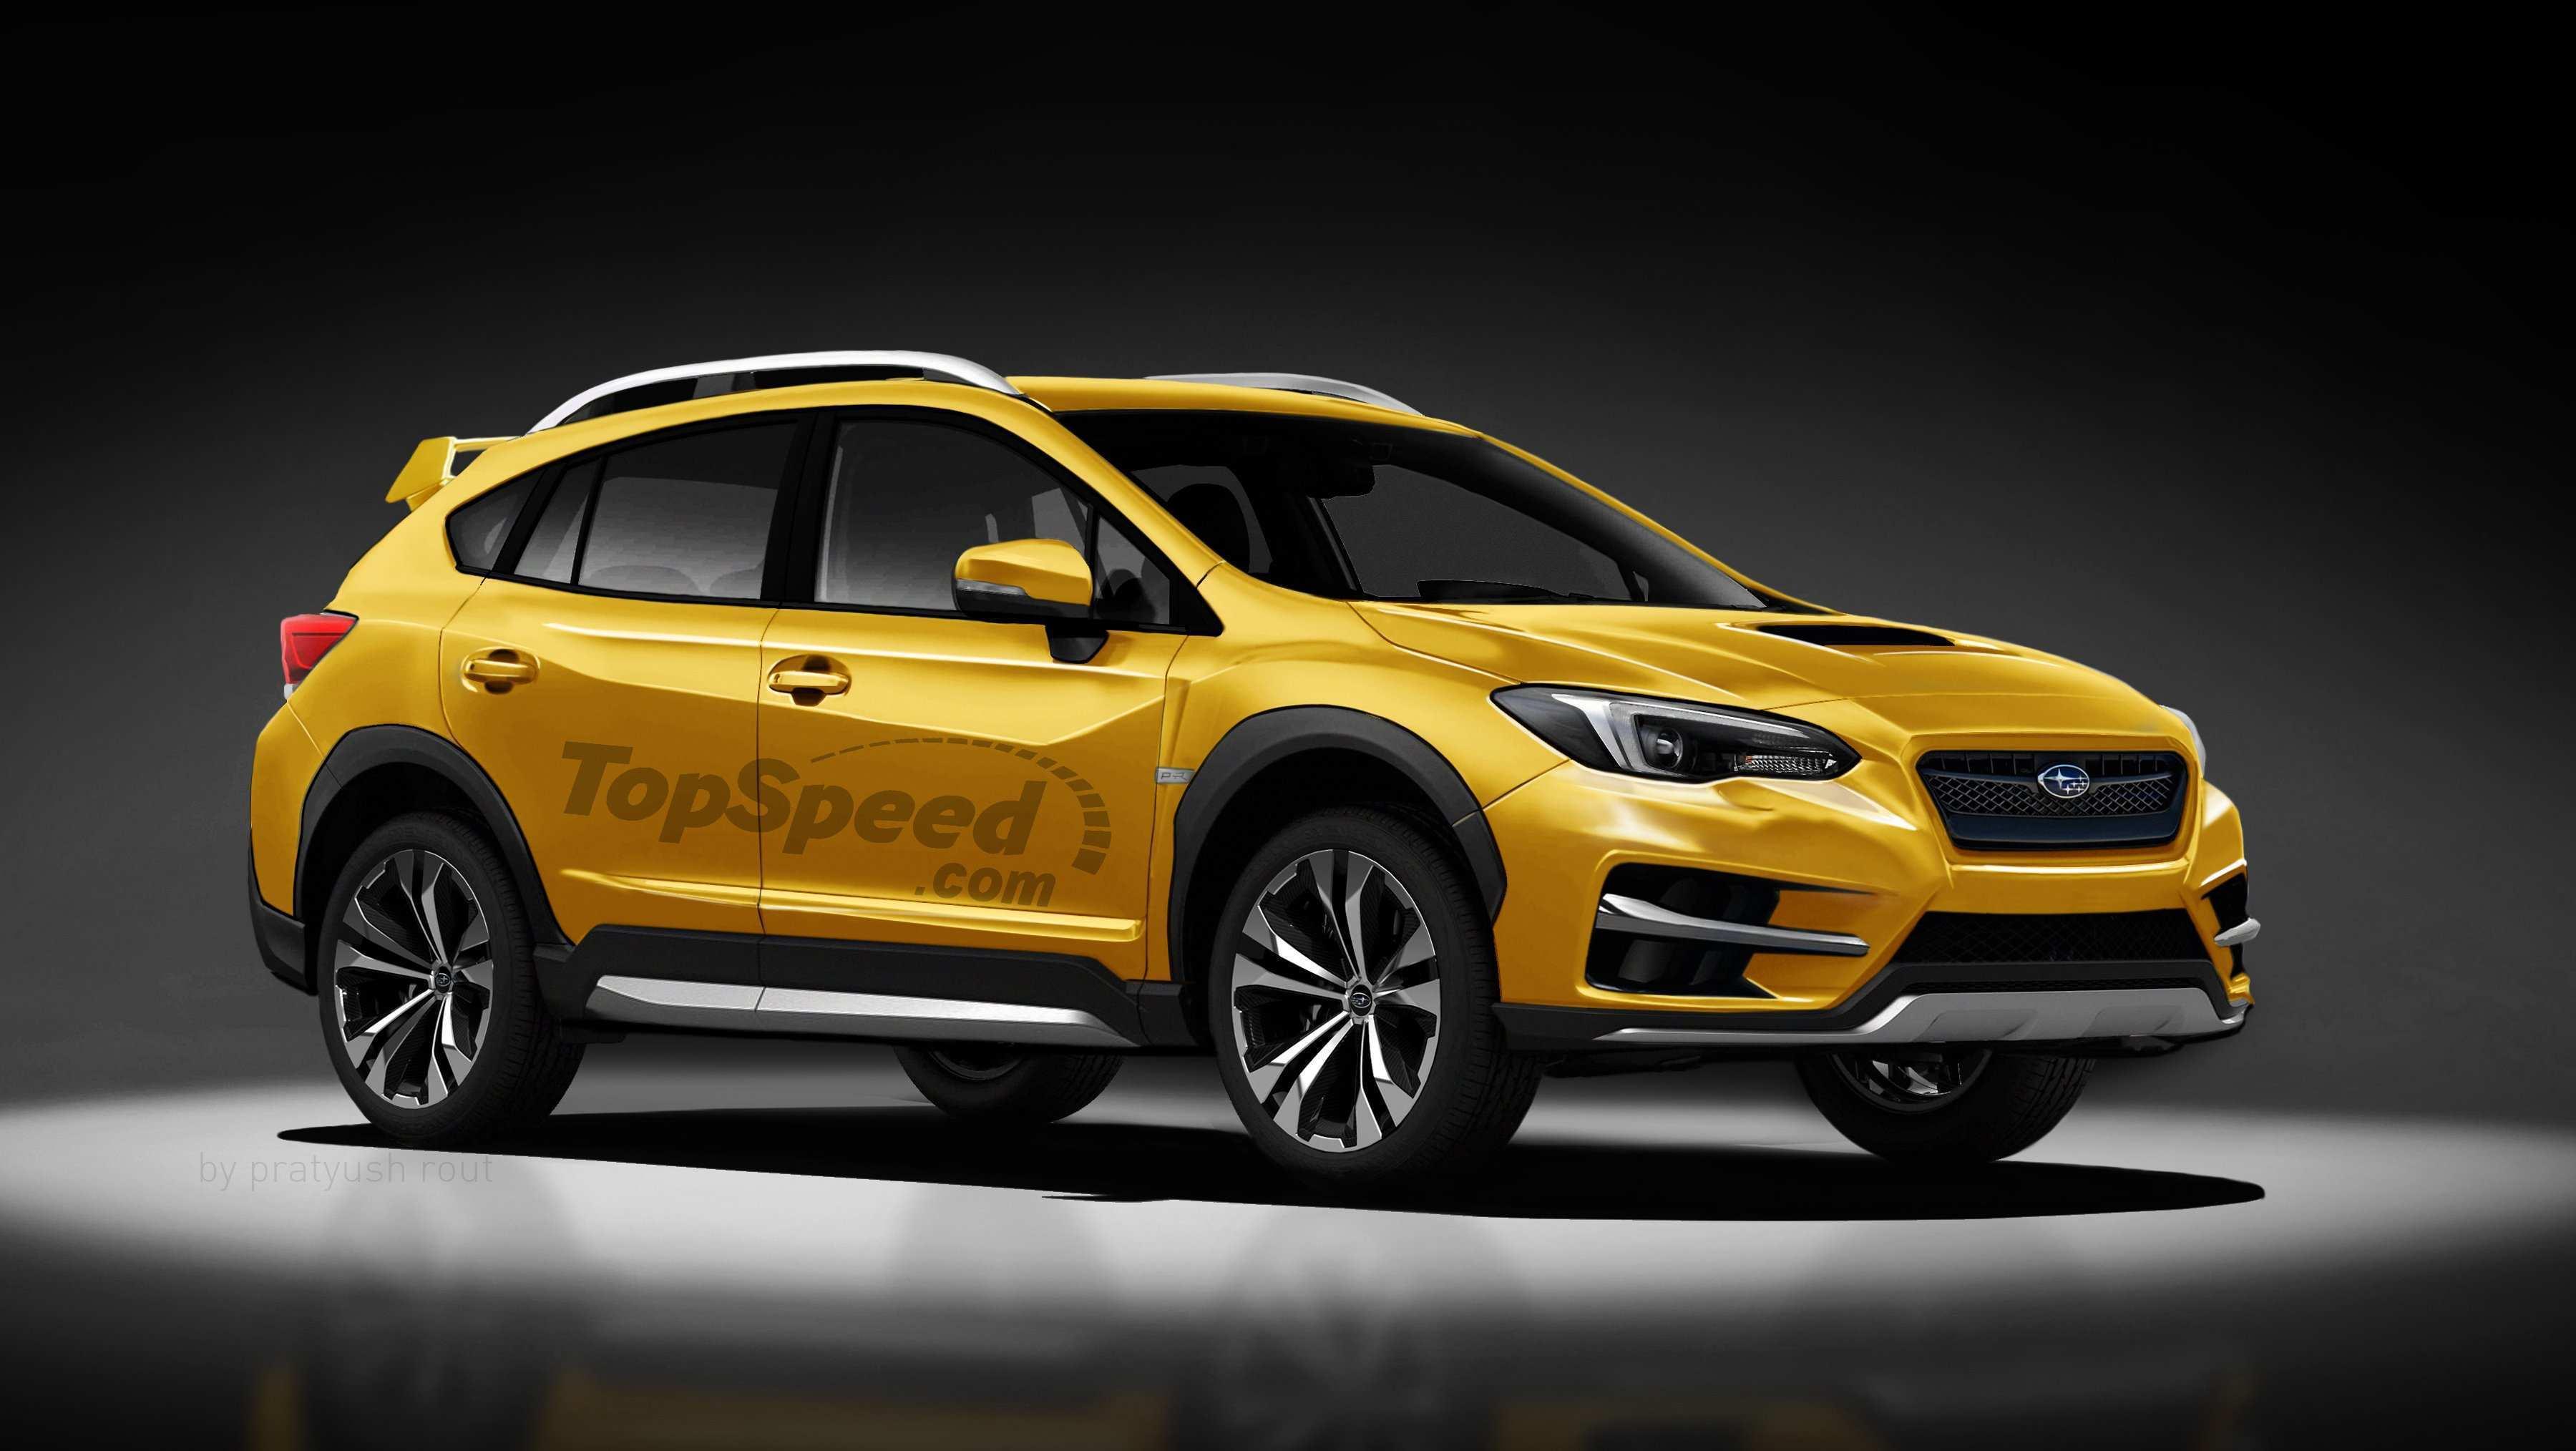 51 All New Subaru Electric Car 2020 Performance and New Engine by Subaru Electric Car 2020